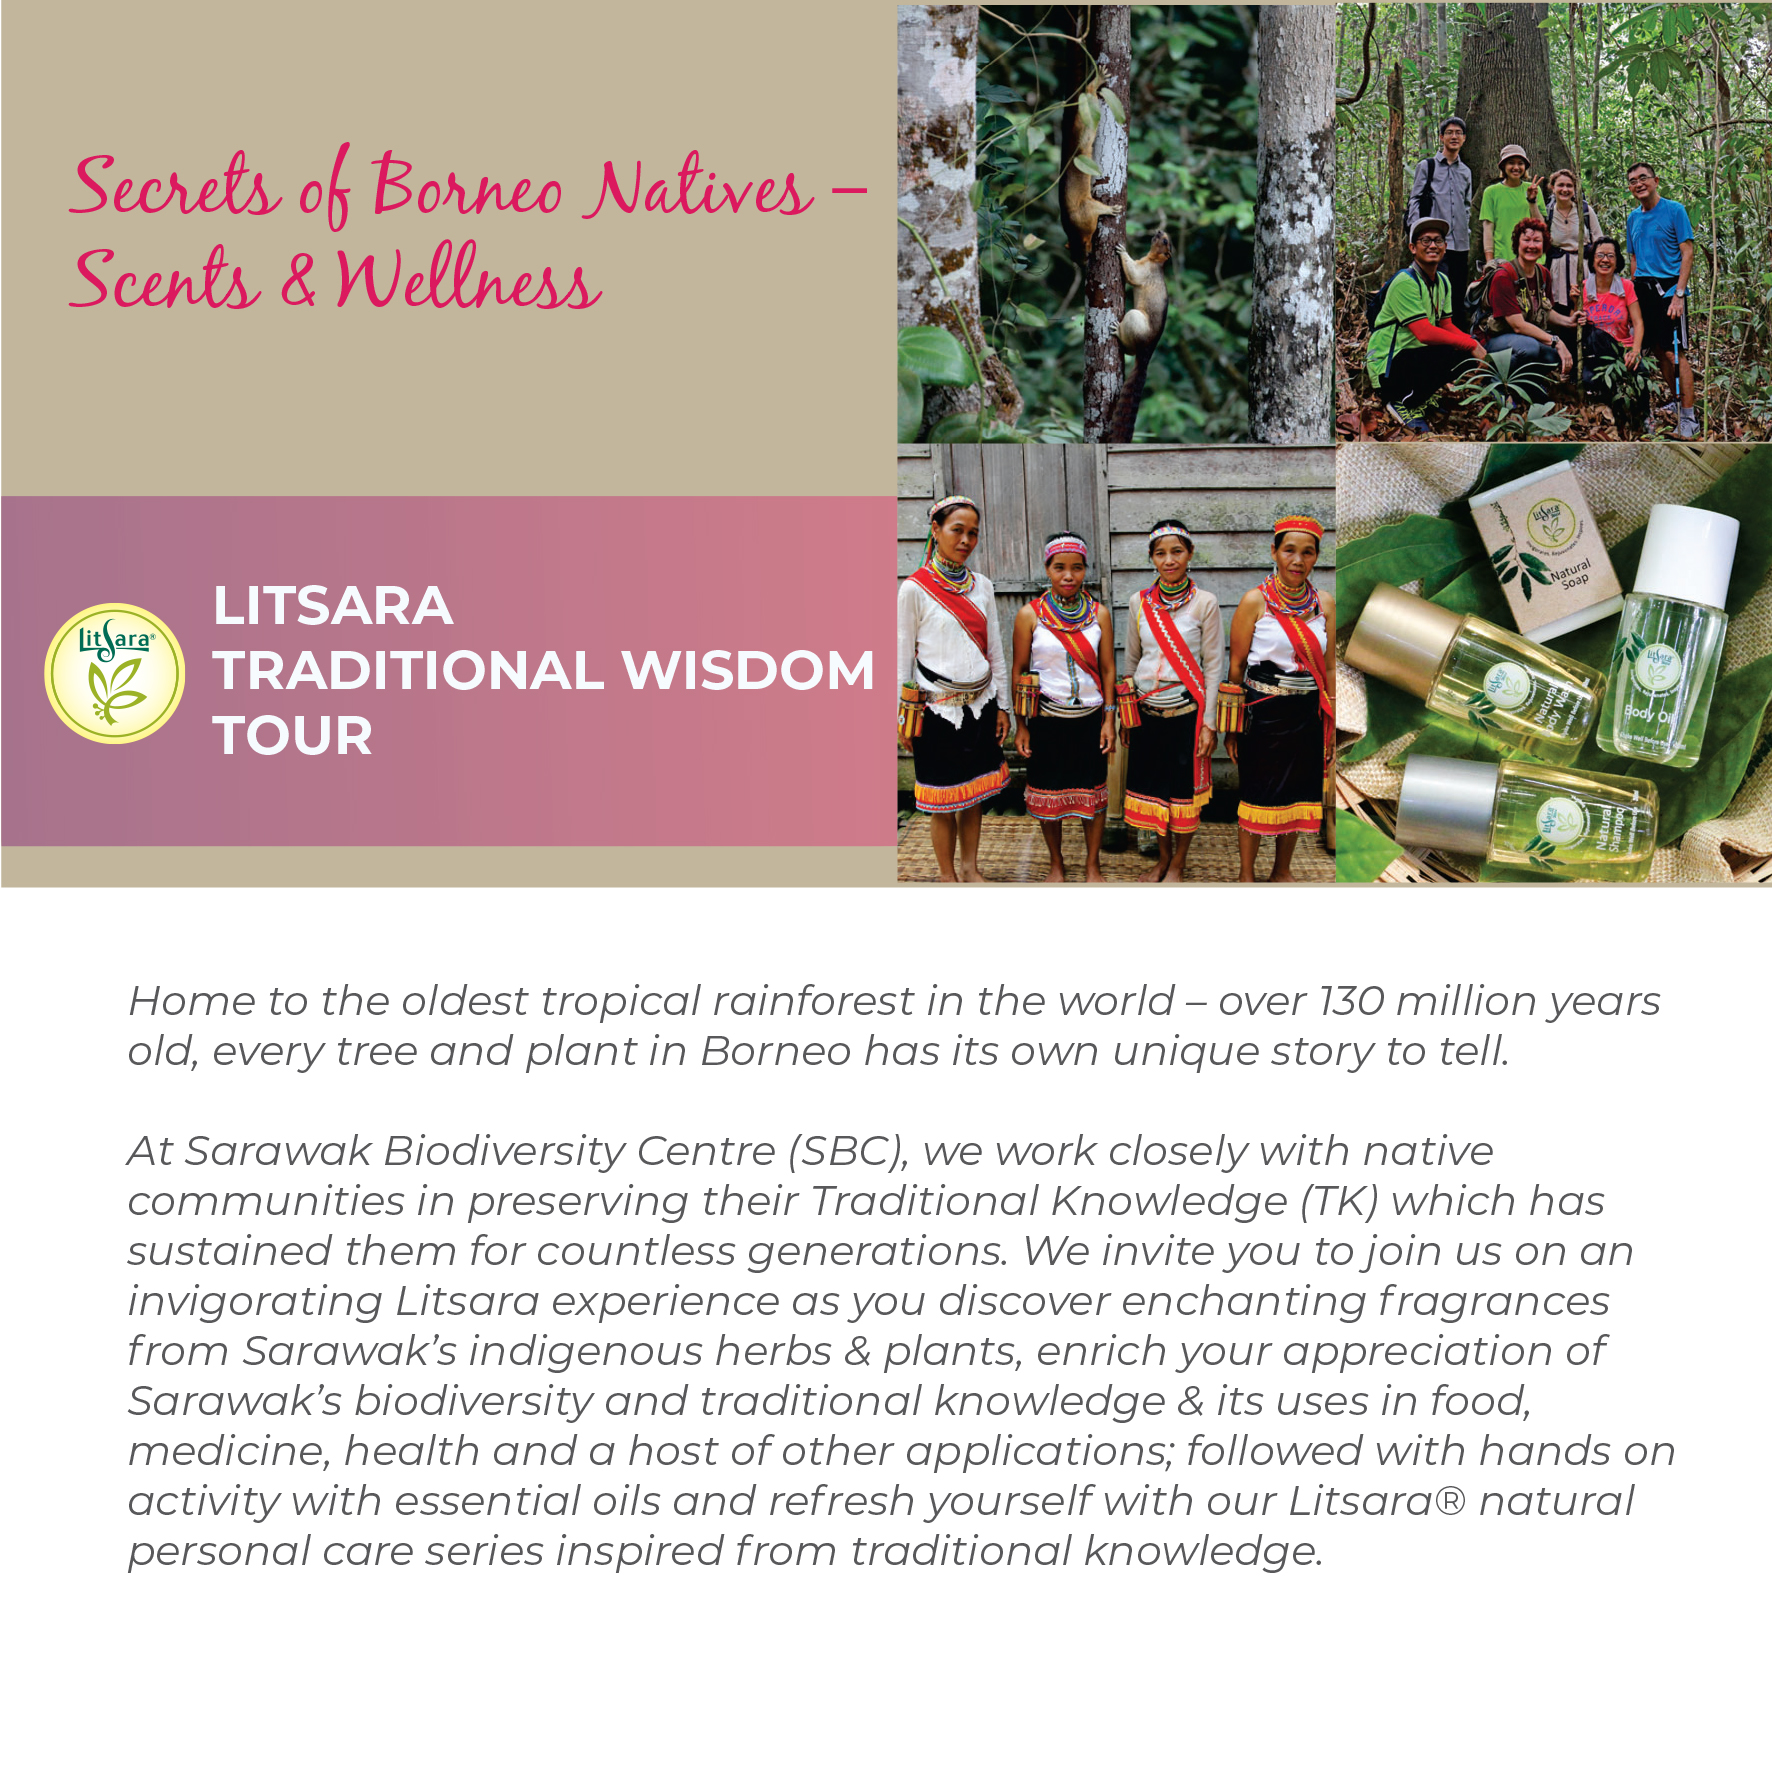 LitSara Traditional Wisdom Tour Leaflet